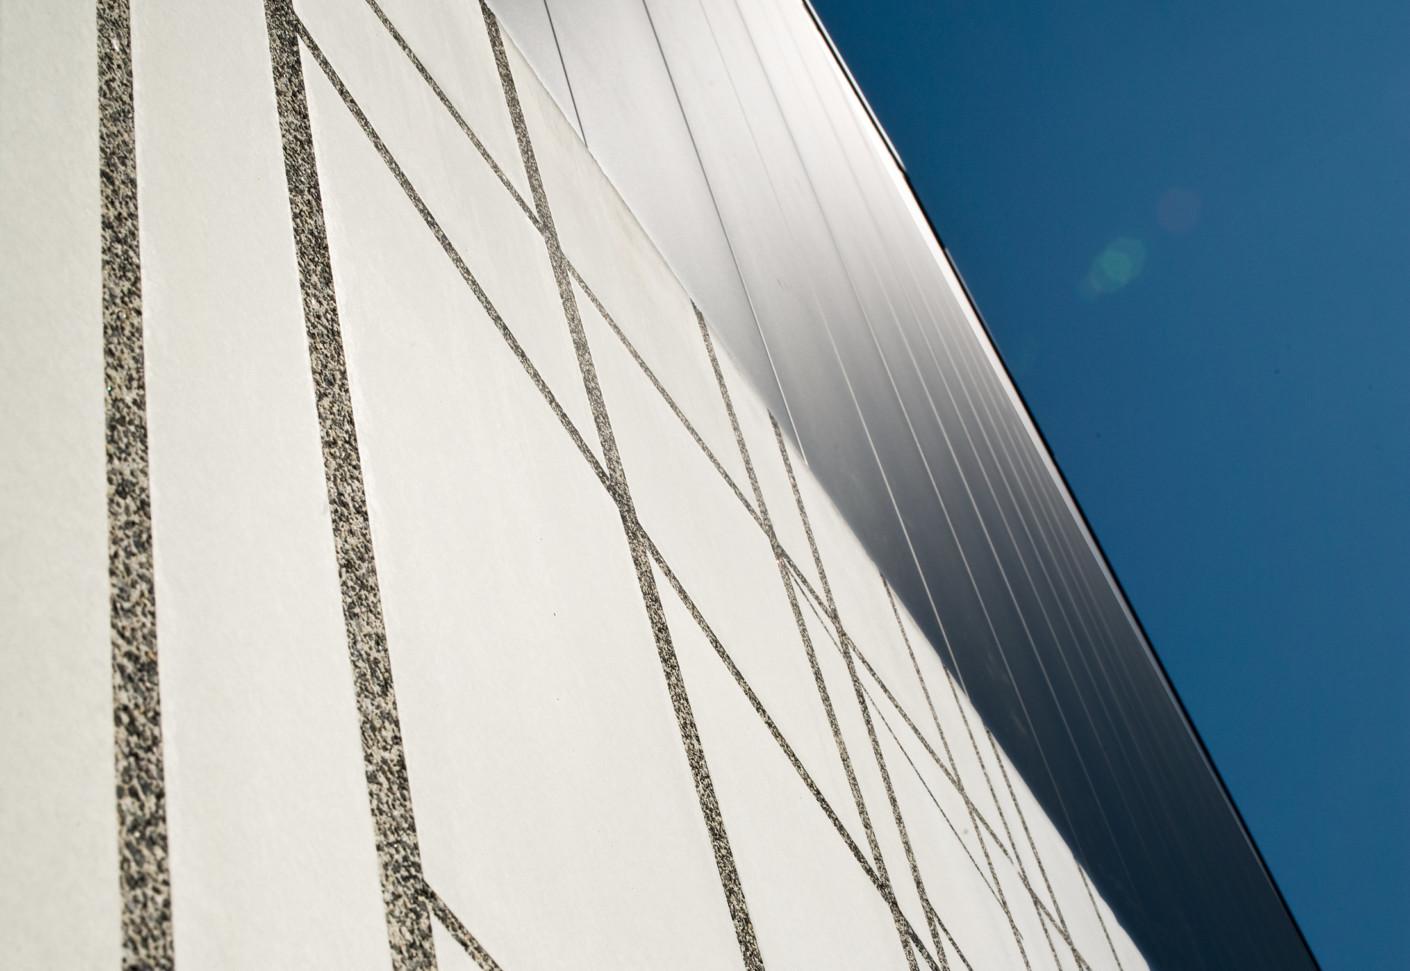 ... Pro™ Kerteminde Efterskole School by Graphic Concrete™ | STYLEPARK